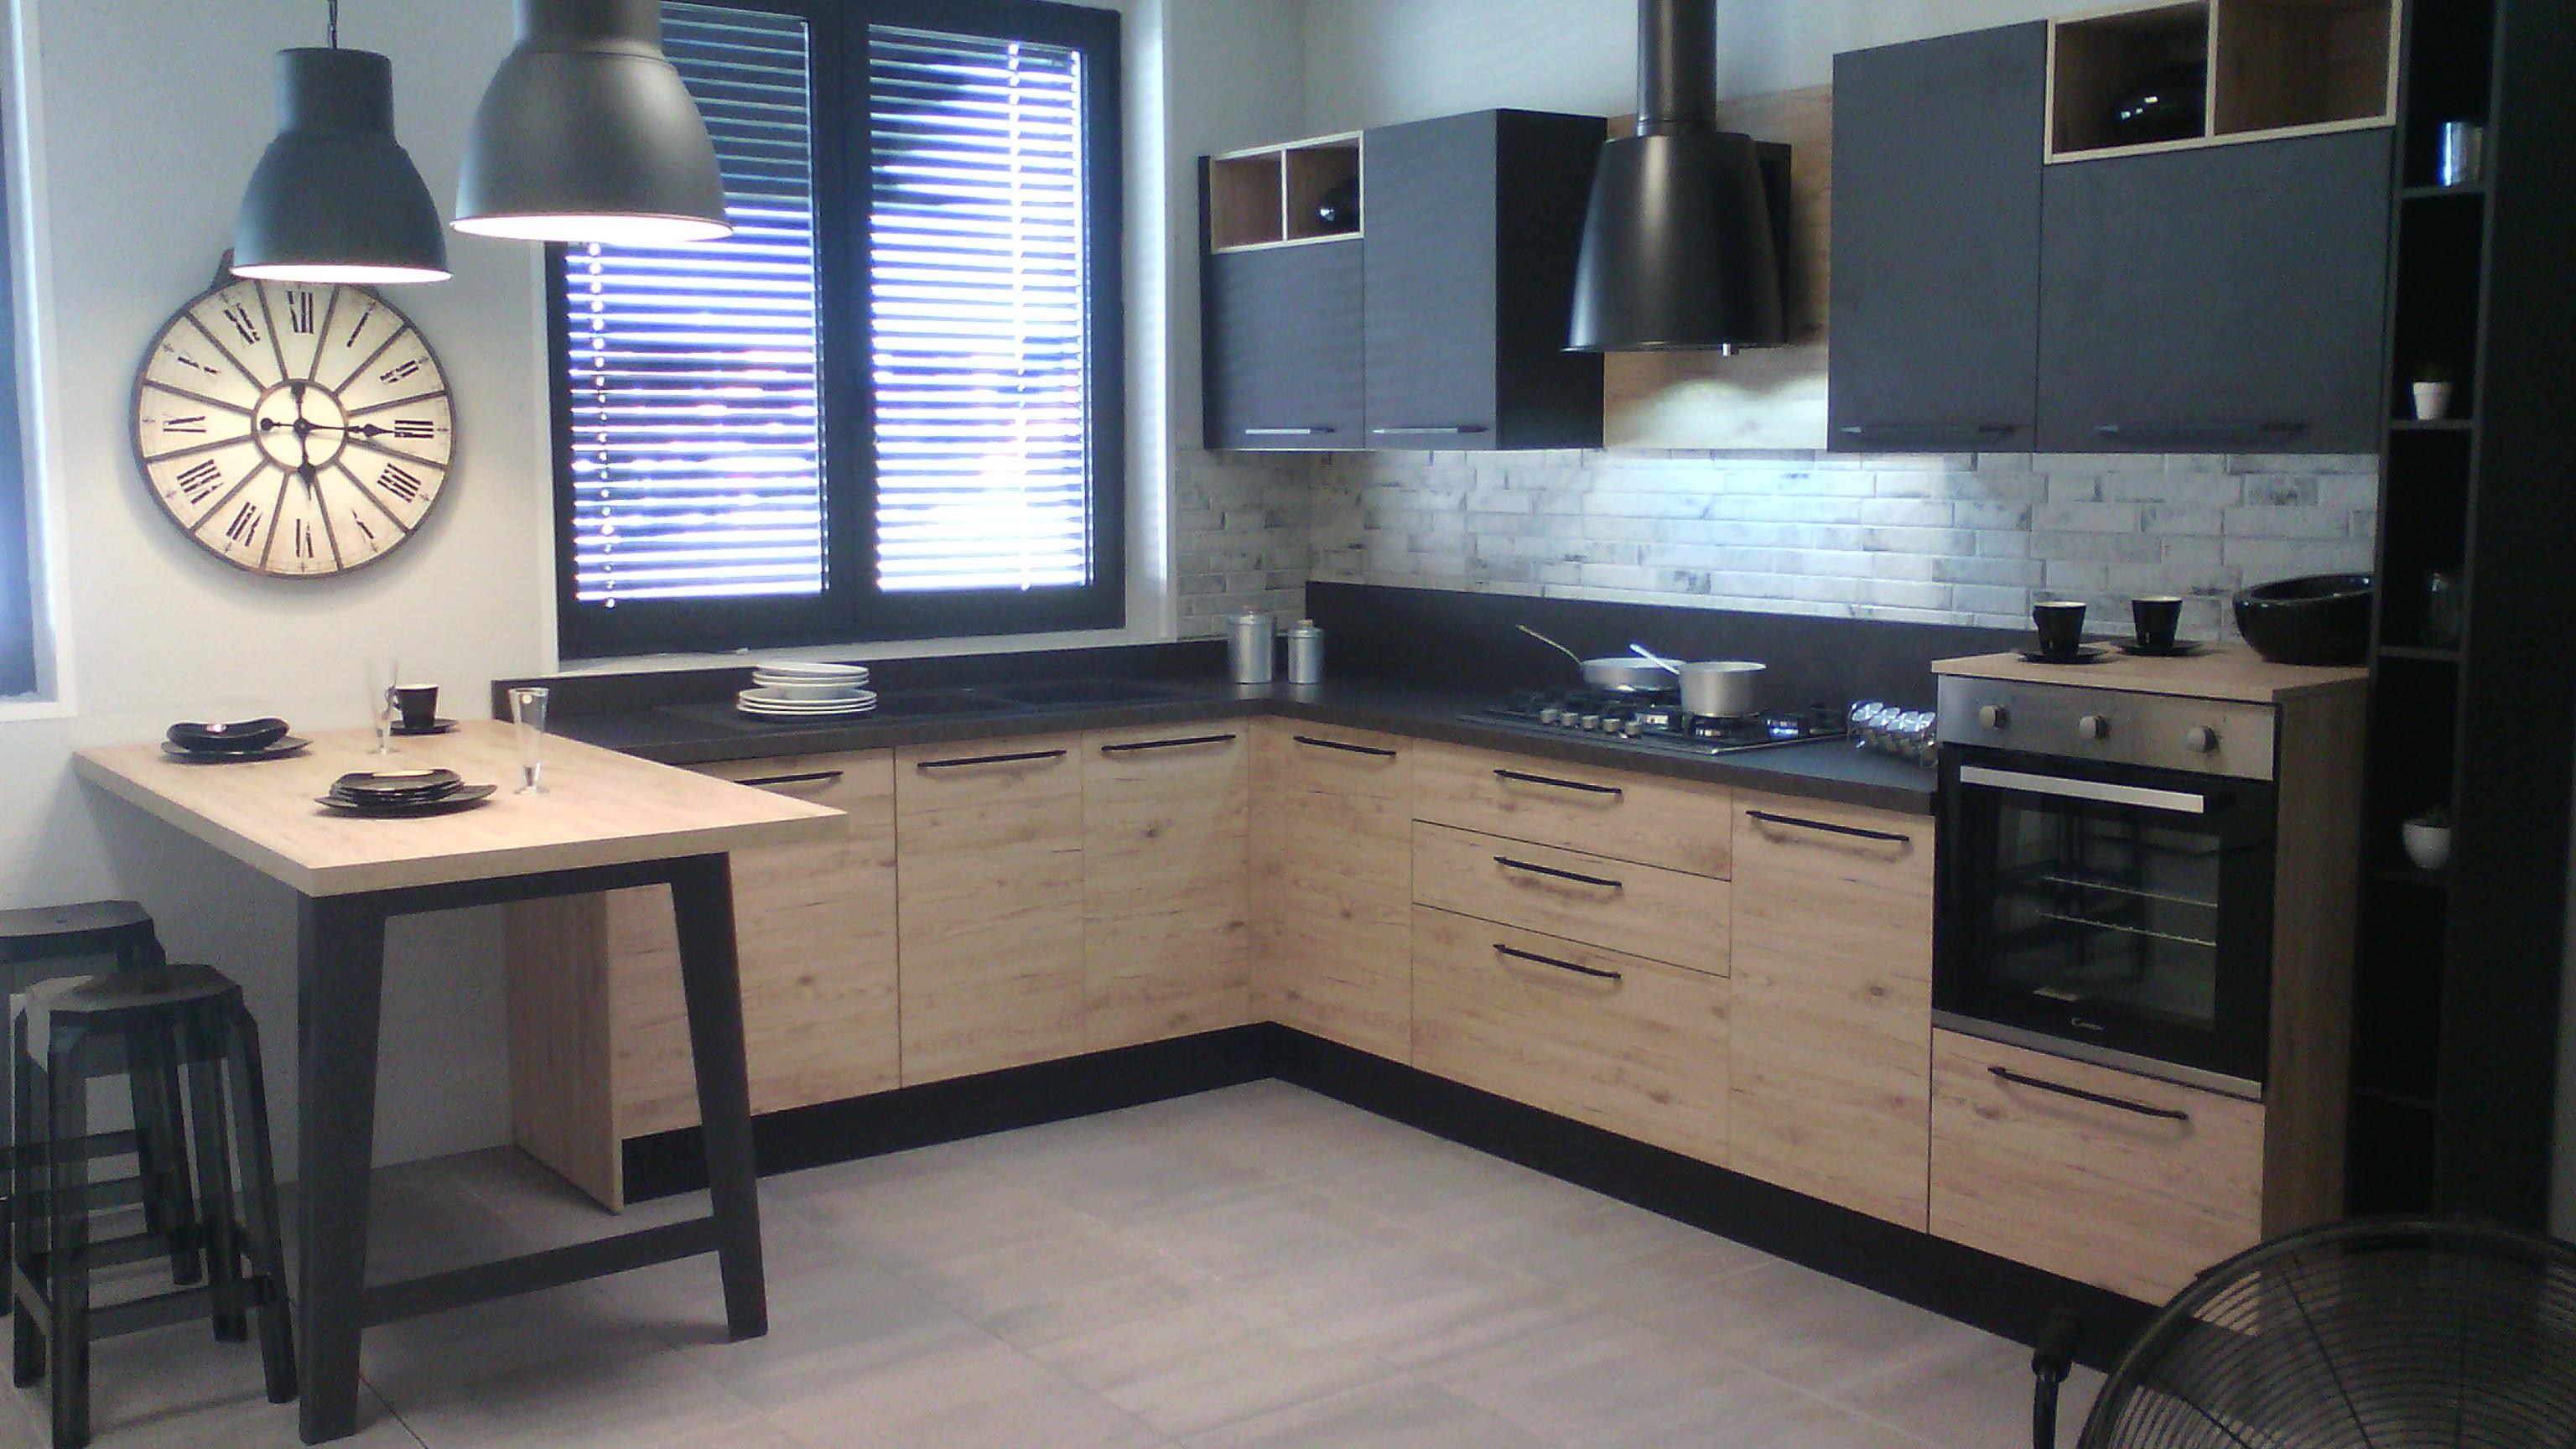 Offerta cucina urban style outlet della cucina - Cucine urban style ...